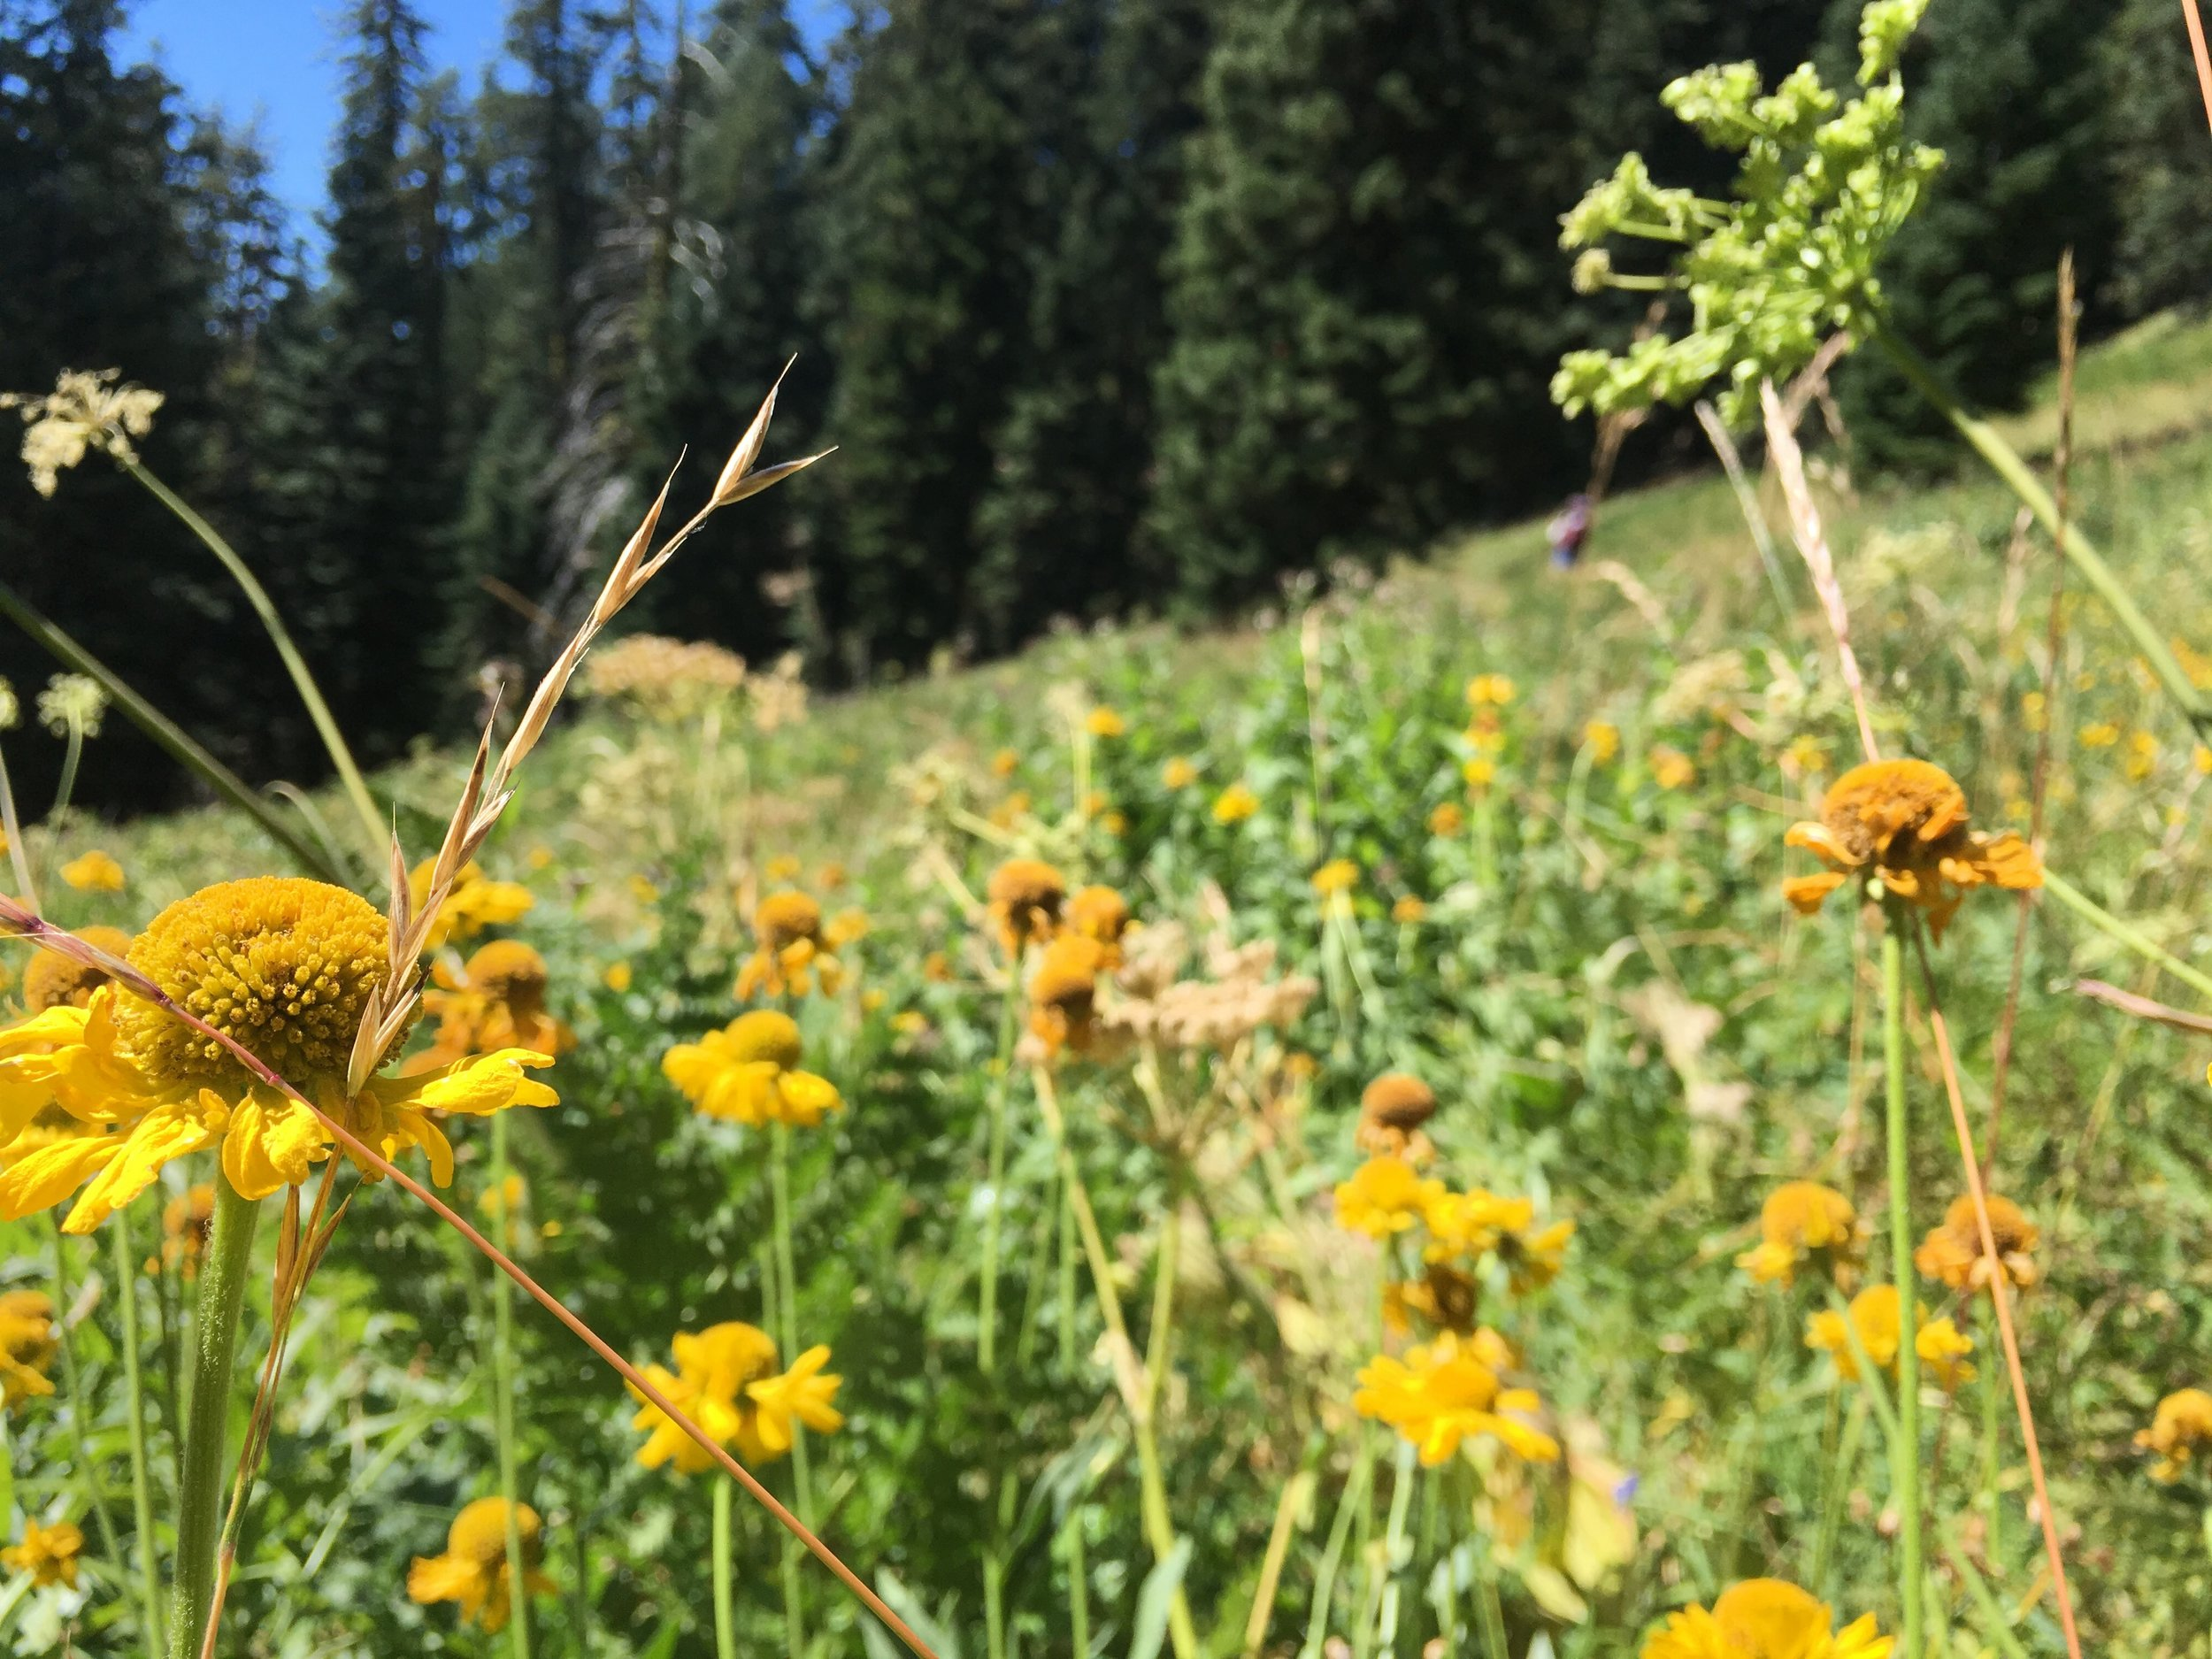 Late season wildflowers on the slopes of Mt. Ashland.